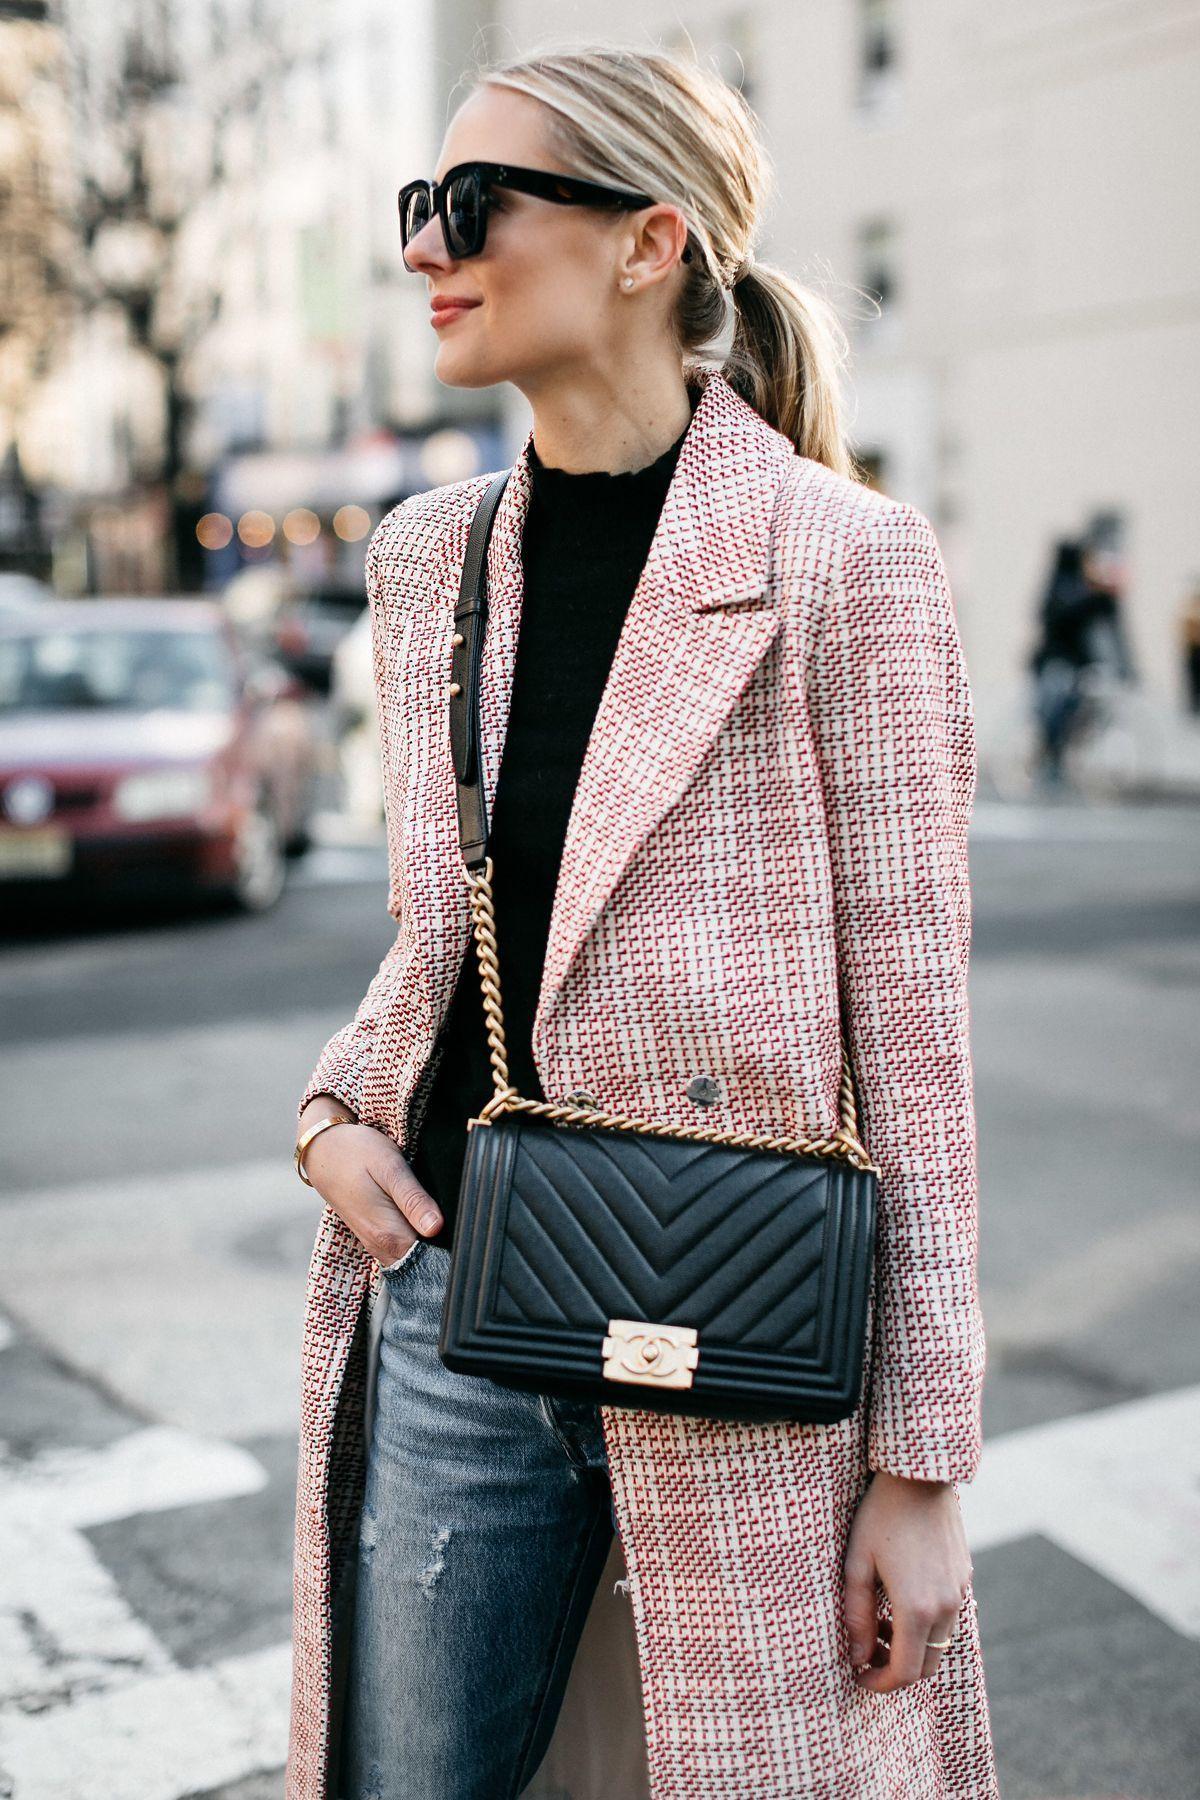 60d546d726b093 Blonde Woman Wearing HM Tweed Coat Ripped Jeans Chanel Black Chevron Boy  Bag Fashion Jackson Dallas Blogger Fashion Blogger Street Style NYFW # ...